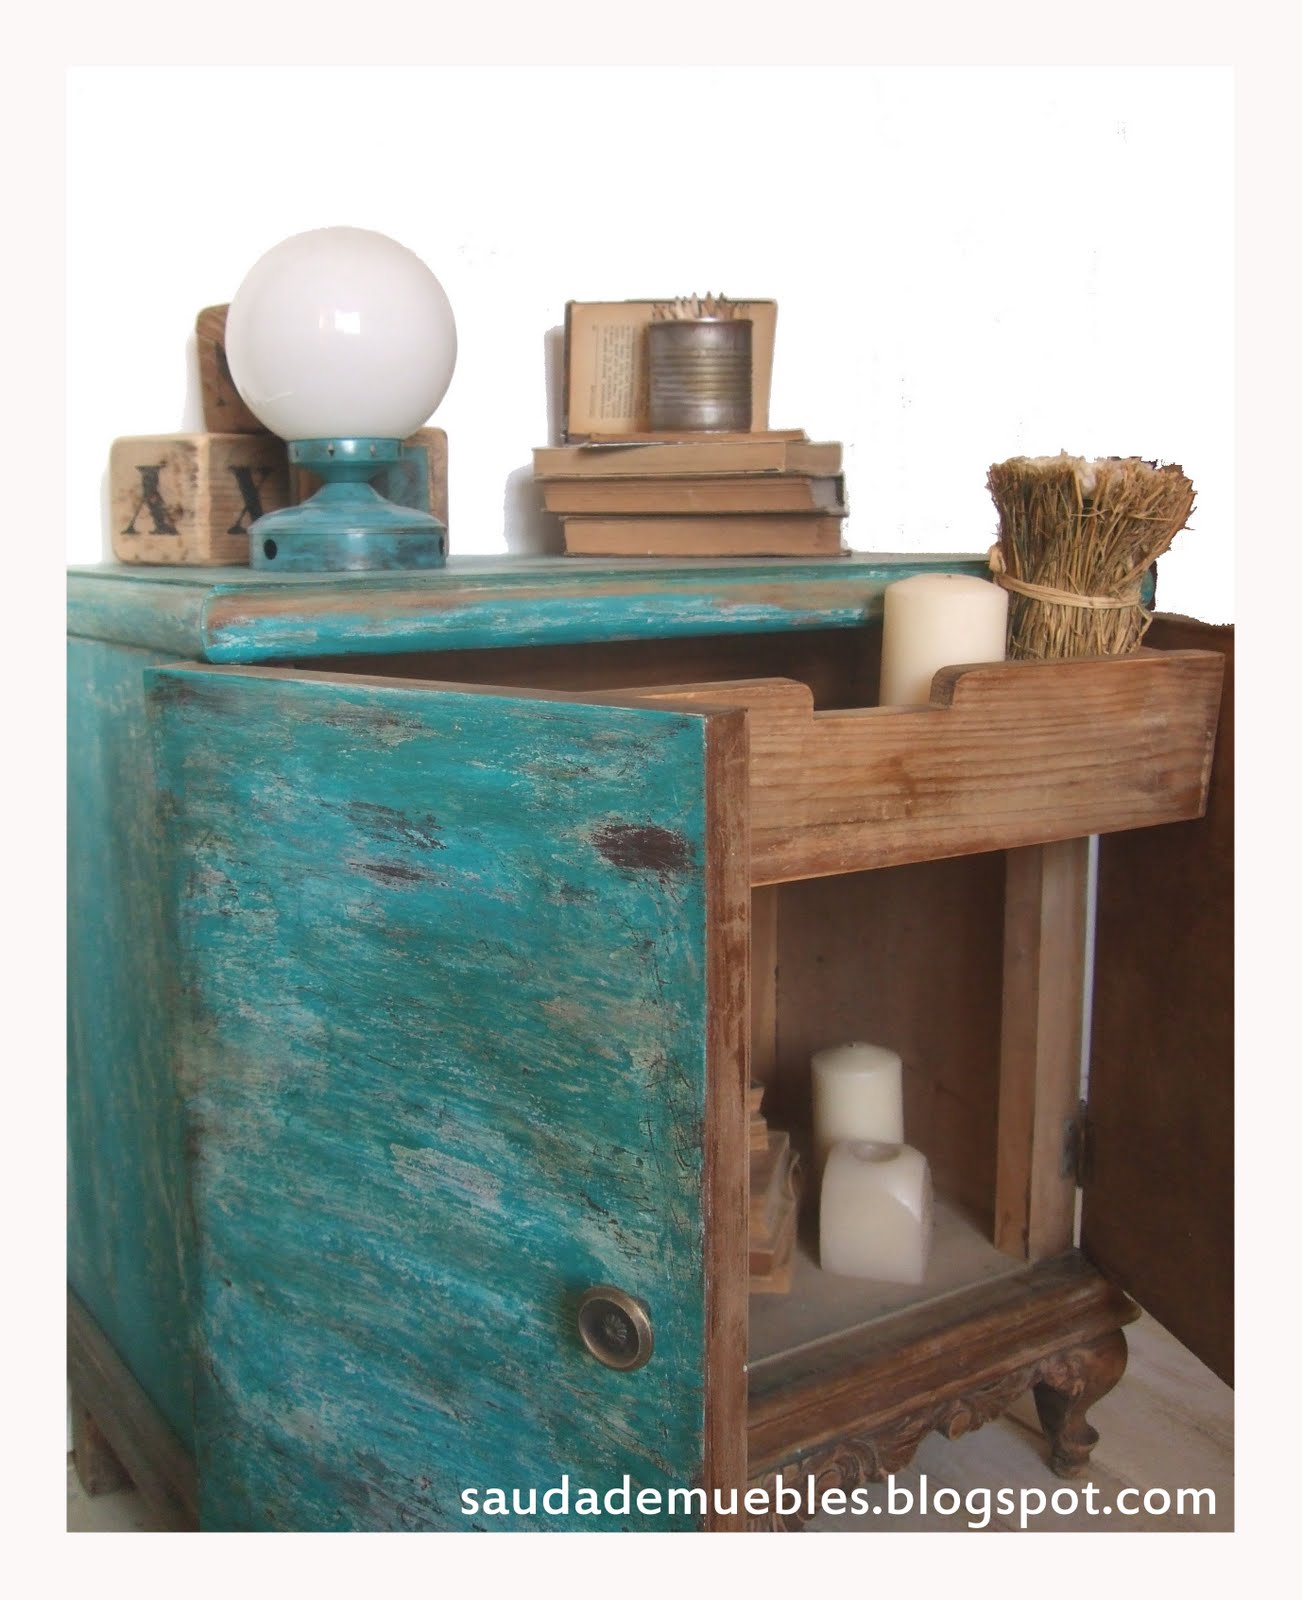 Saudade mayo 2011 - Muebles de madera sin tratar ...